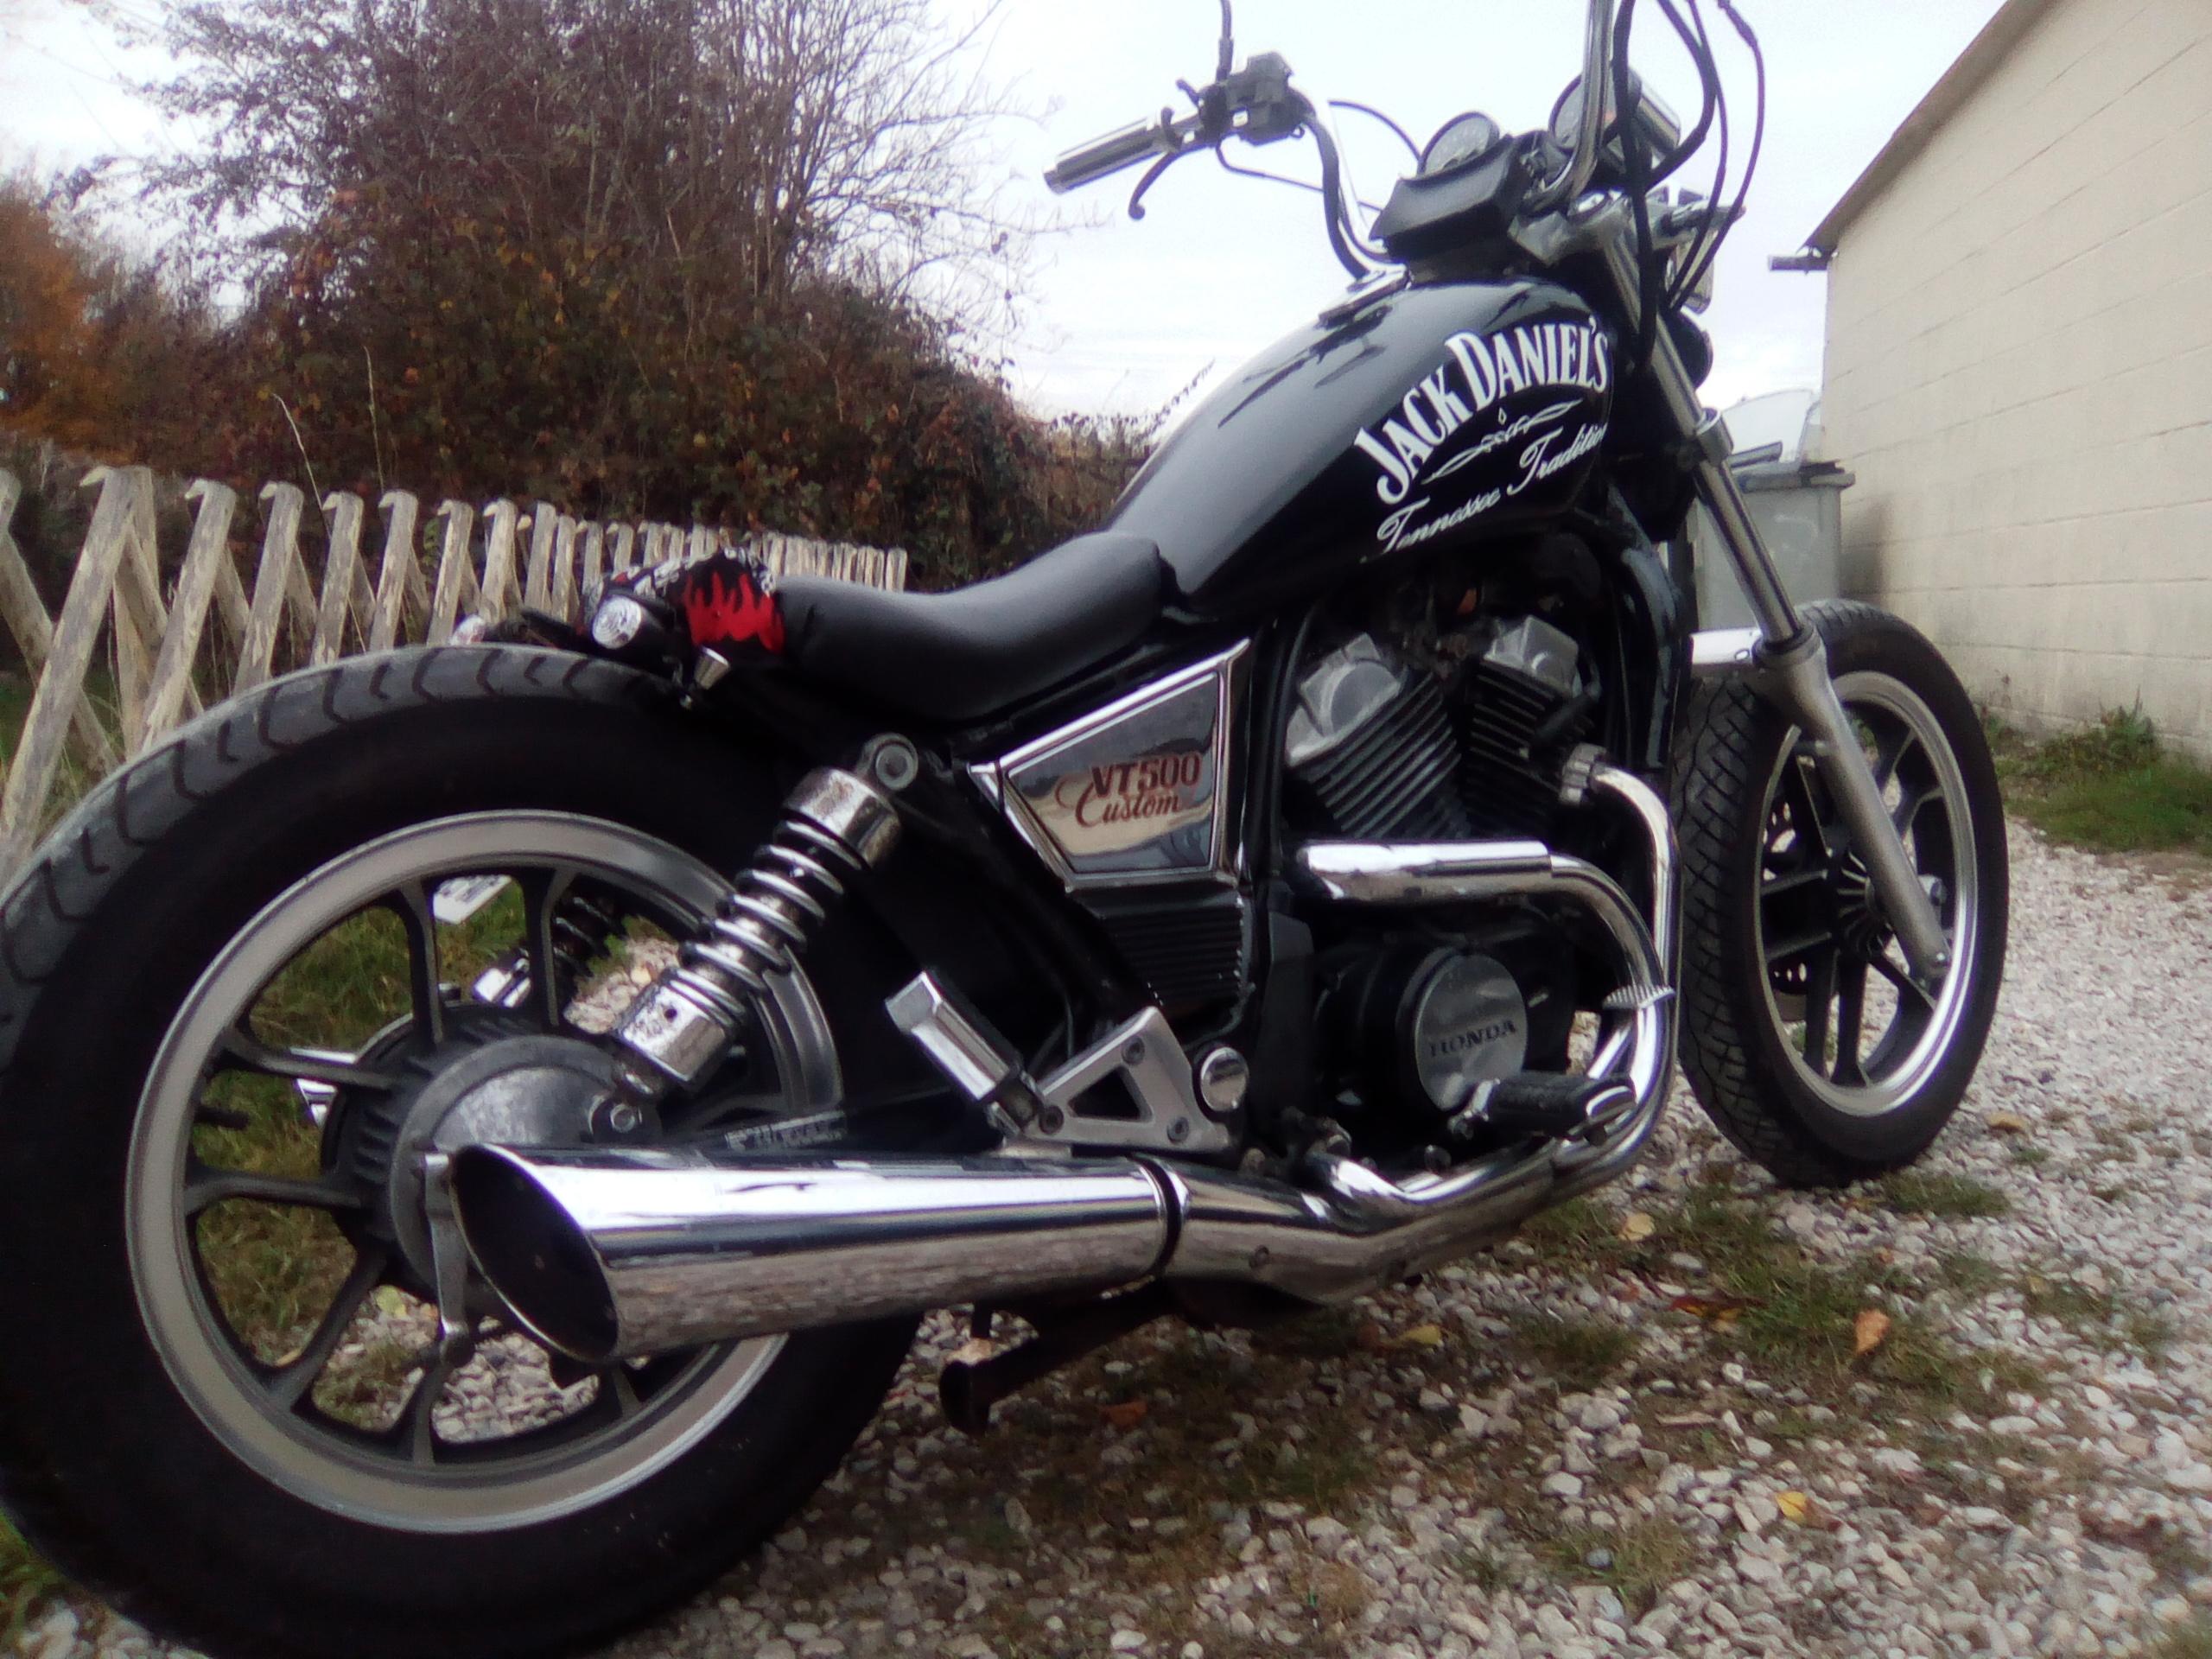 vt500c  transformation  en bobber, mes motos Deauville, Shadow 600 998674IMG20161104163911